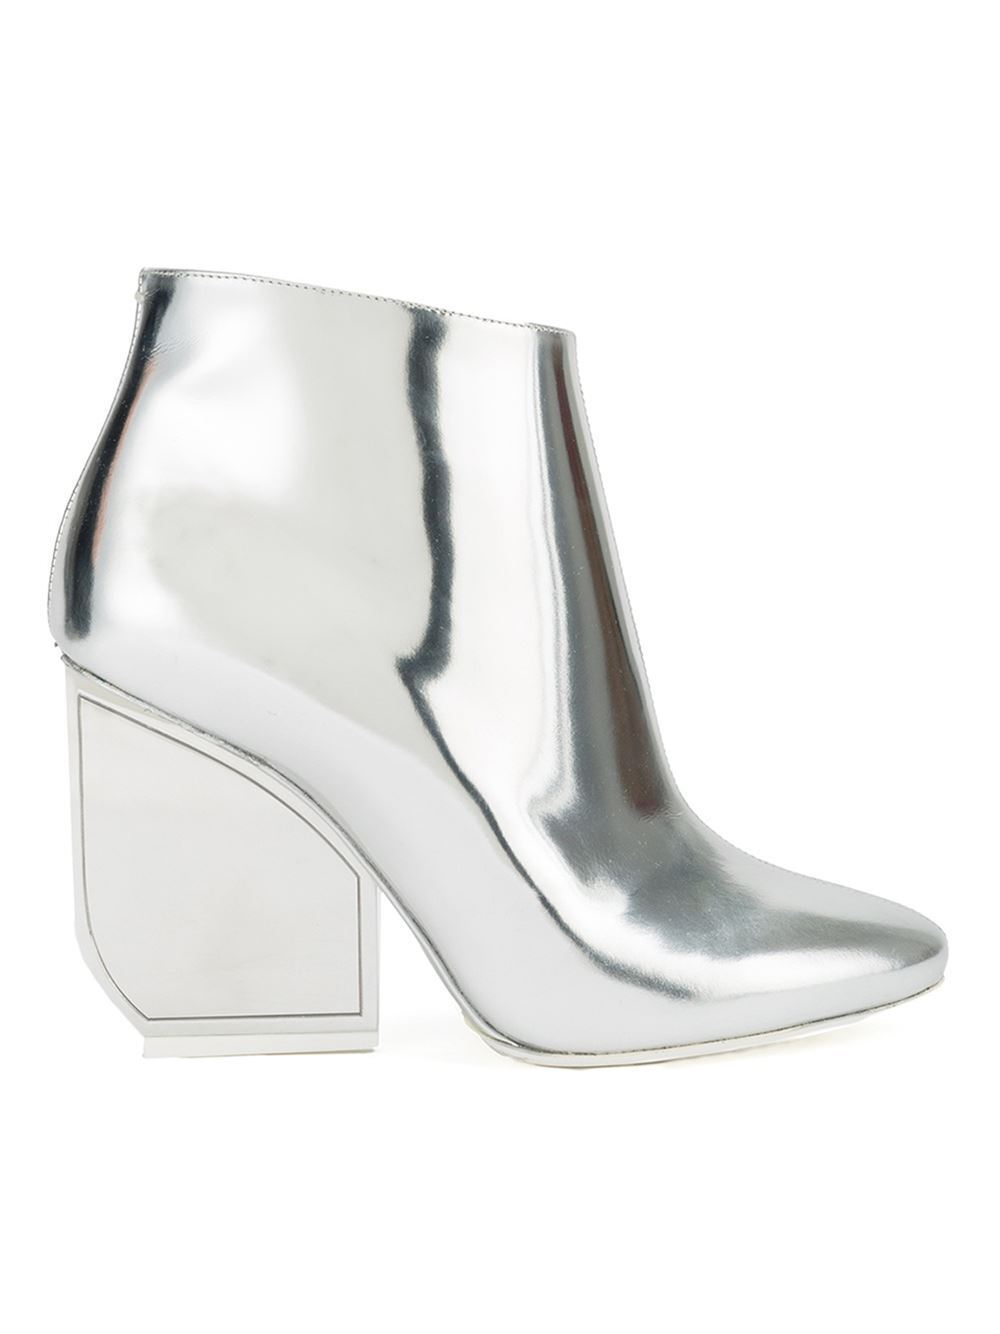 MAISON MARGIELA MARGIELA MARGIELA  Bottines Ankle botas  Ahorre 35% - 70% de descuento